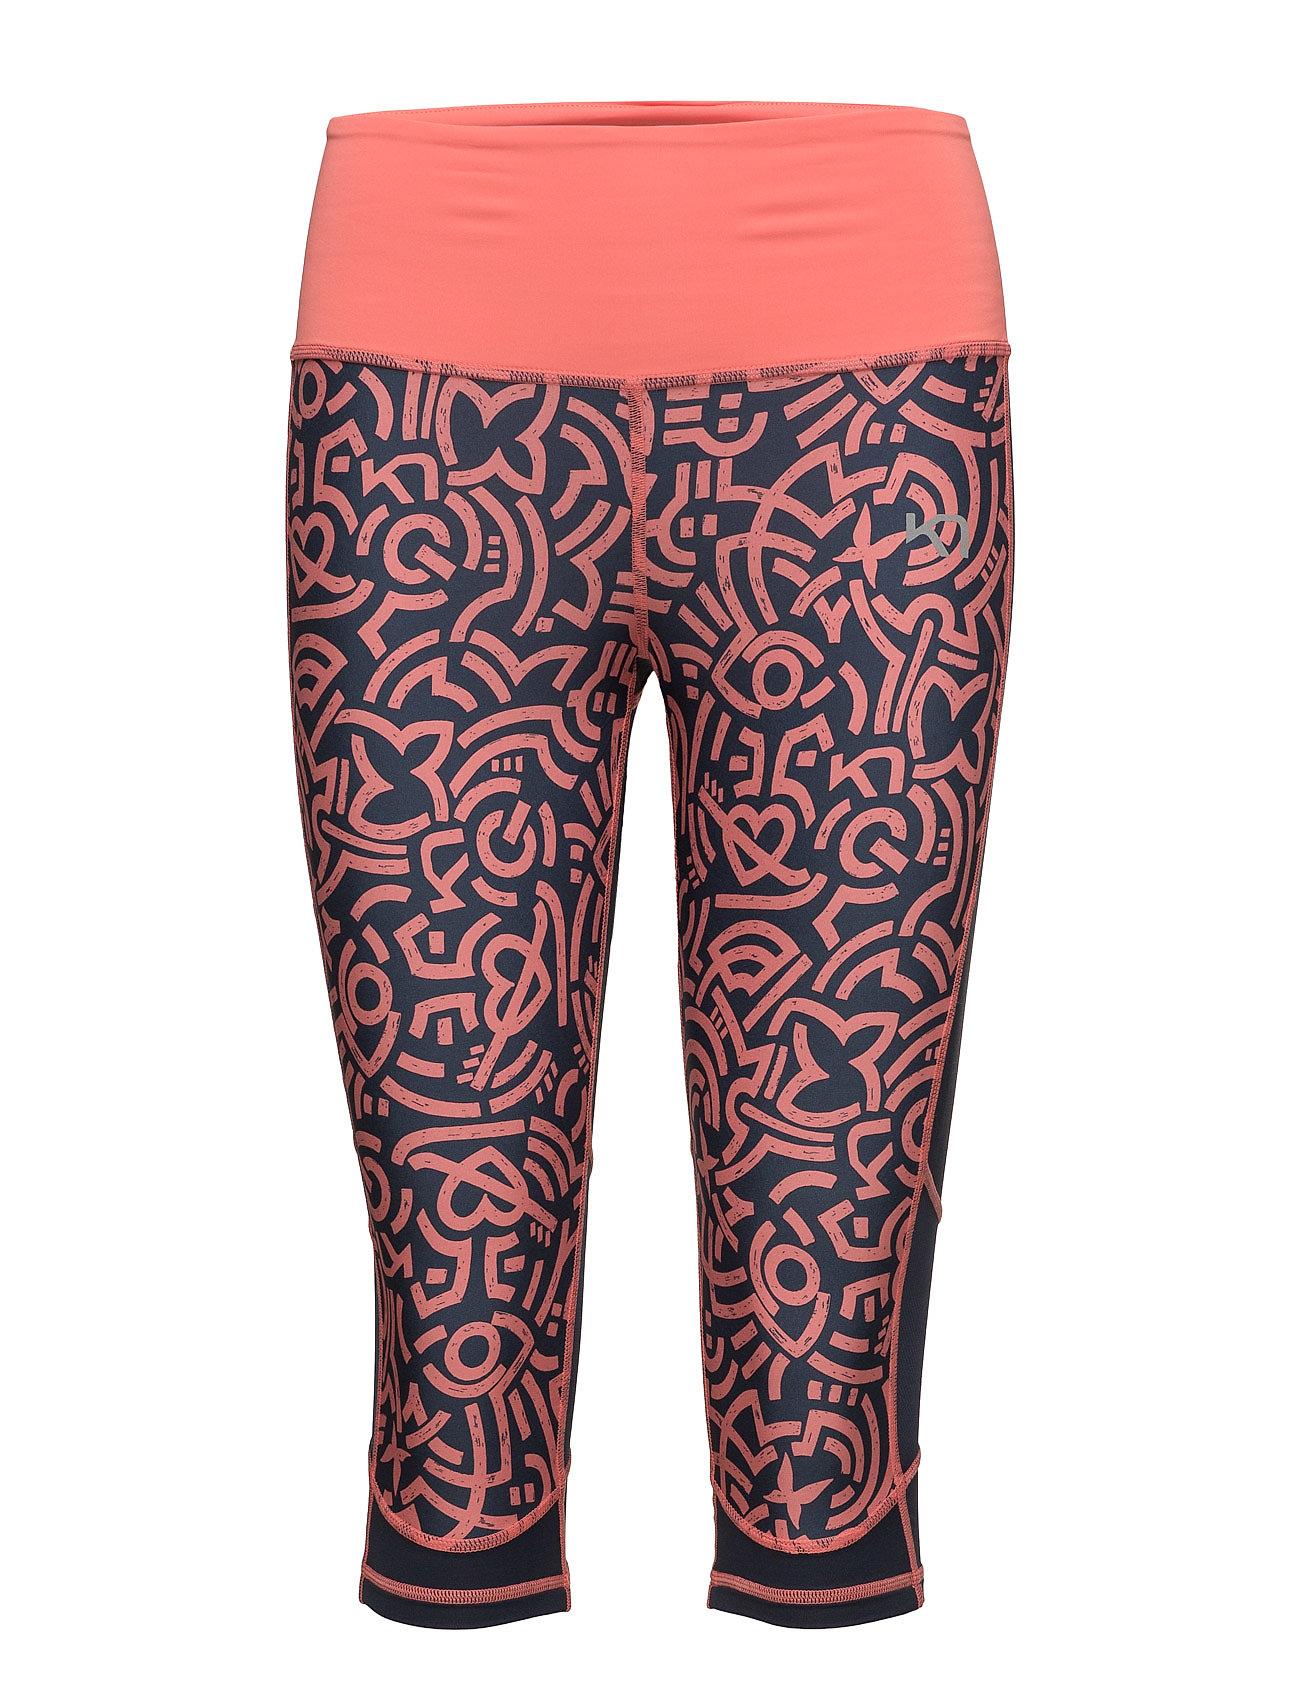 Sarah Capri Kari Traa Sportstøj til Kvinder i